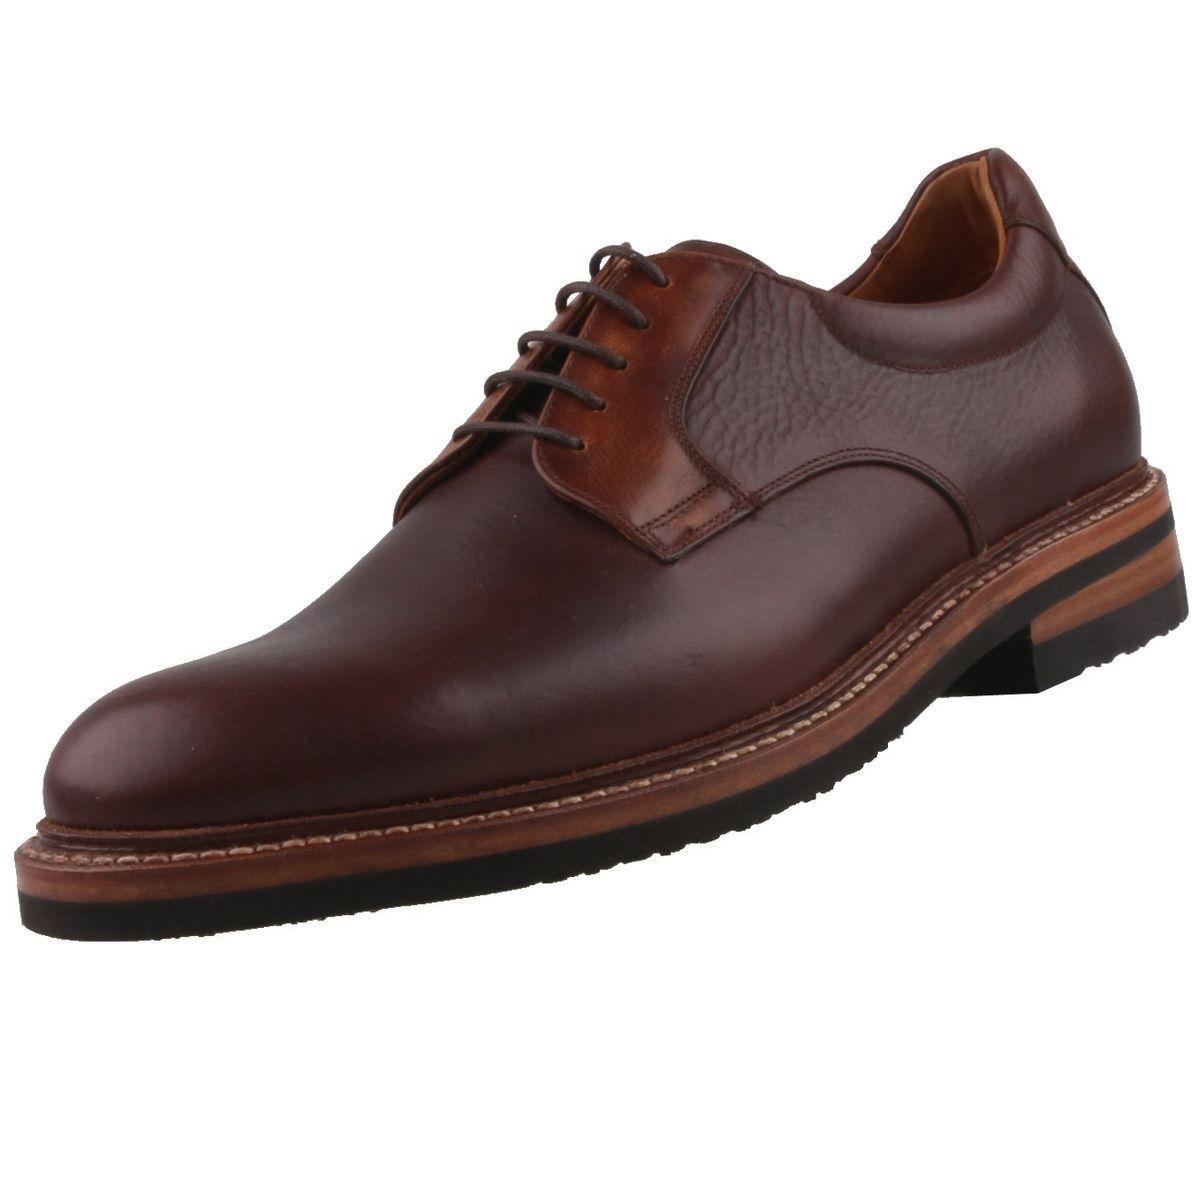 NEUF Sendra Chaussures homme Plates 14783 en cuir à lacets Business